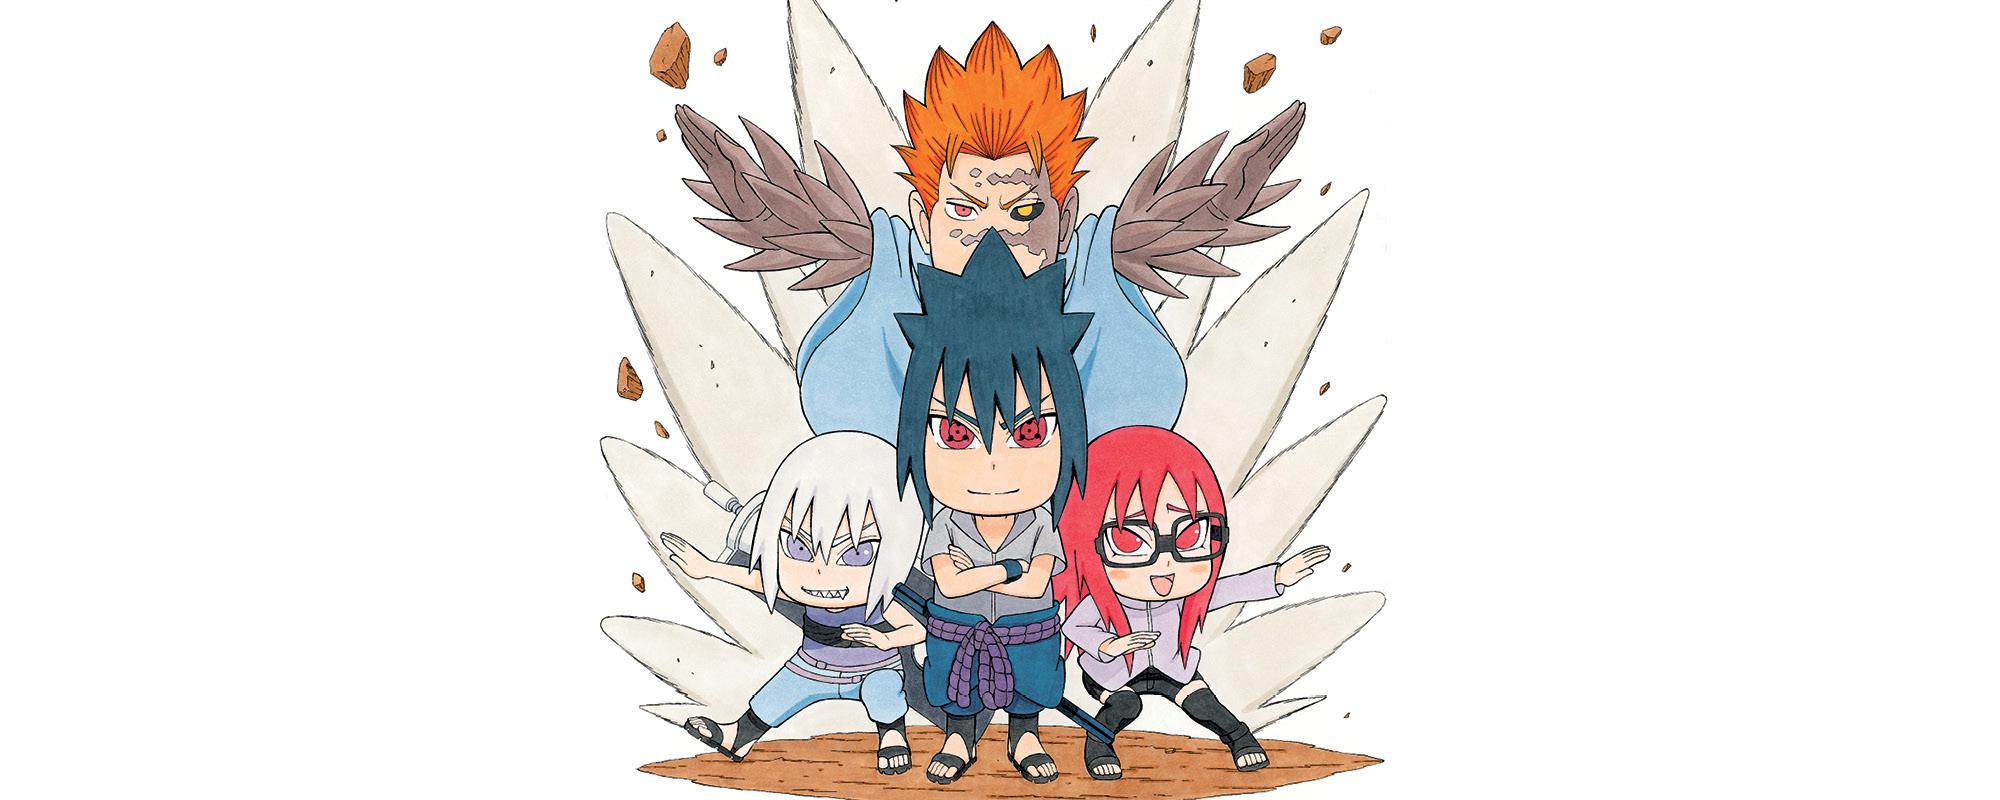 Viz Read Naruto Chibi Sasuke S Sharingan Legend Manga Official Shonen Jump From Japan